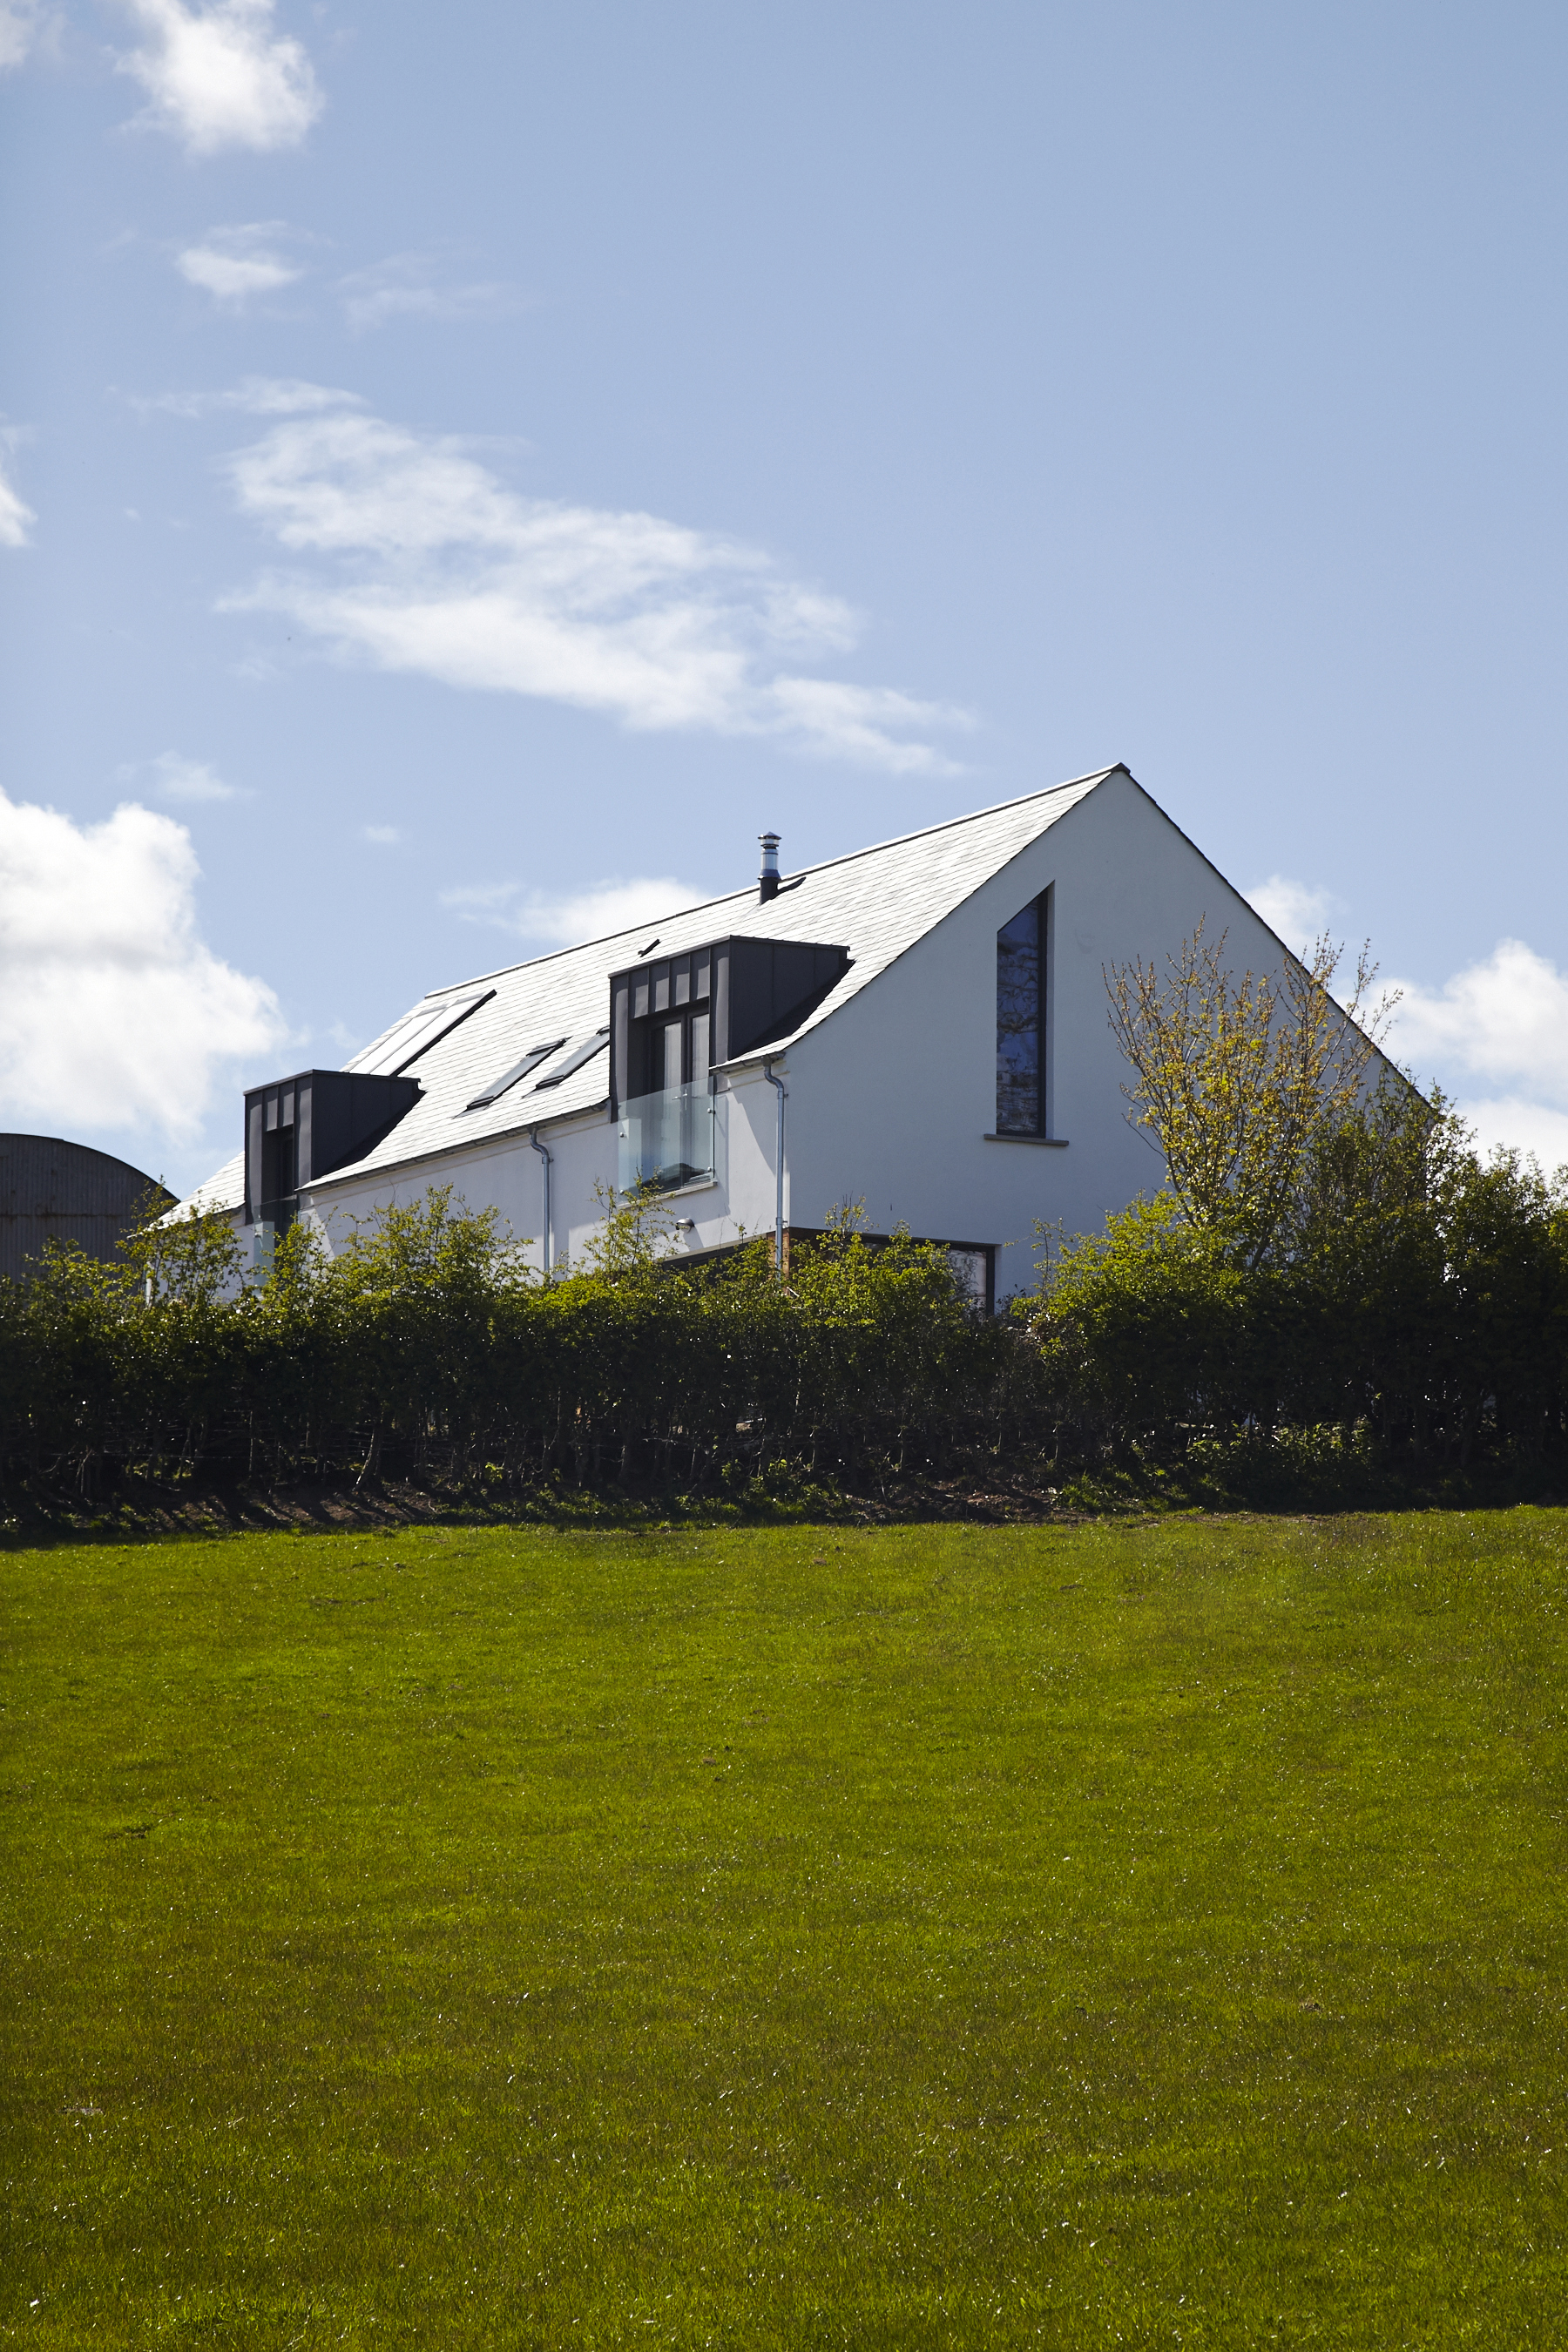 Paul_McAlister_Architects_Passive_House_landscape.jpg